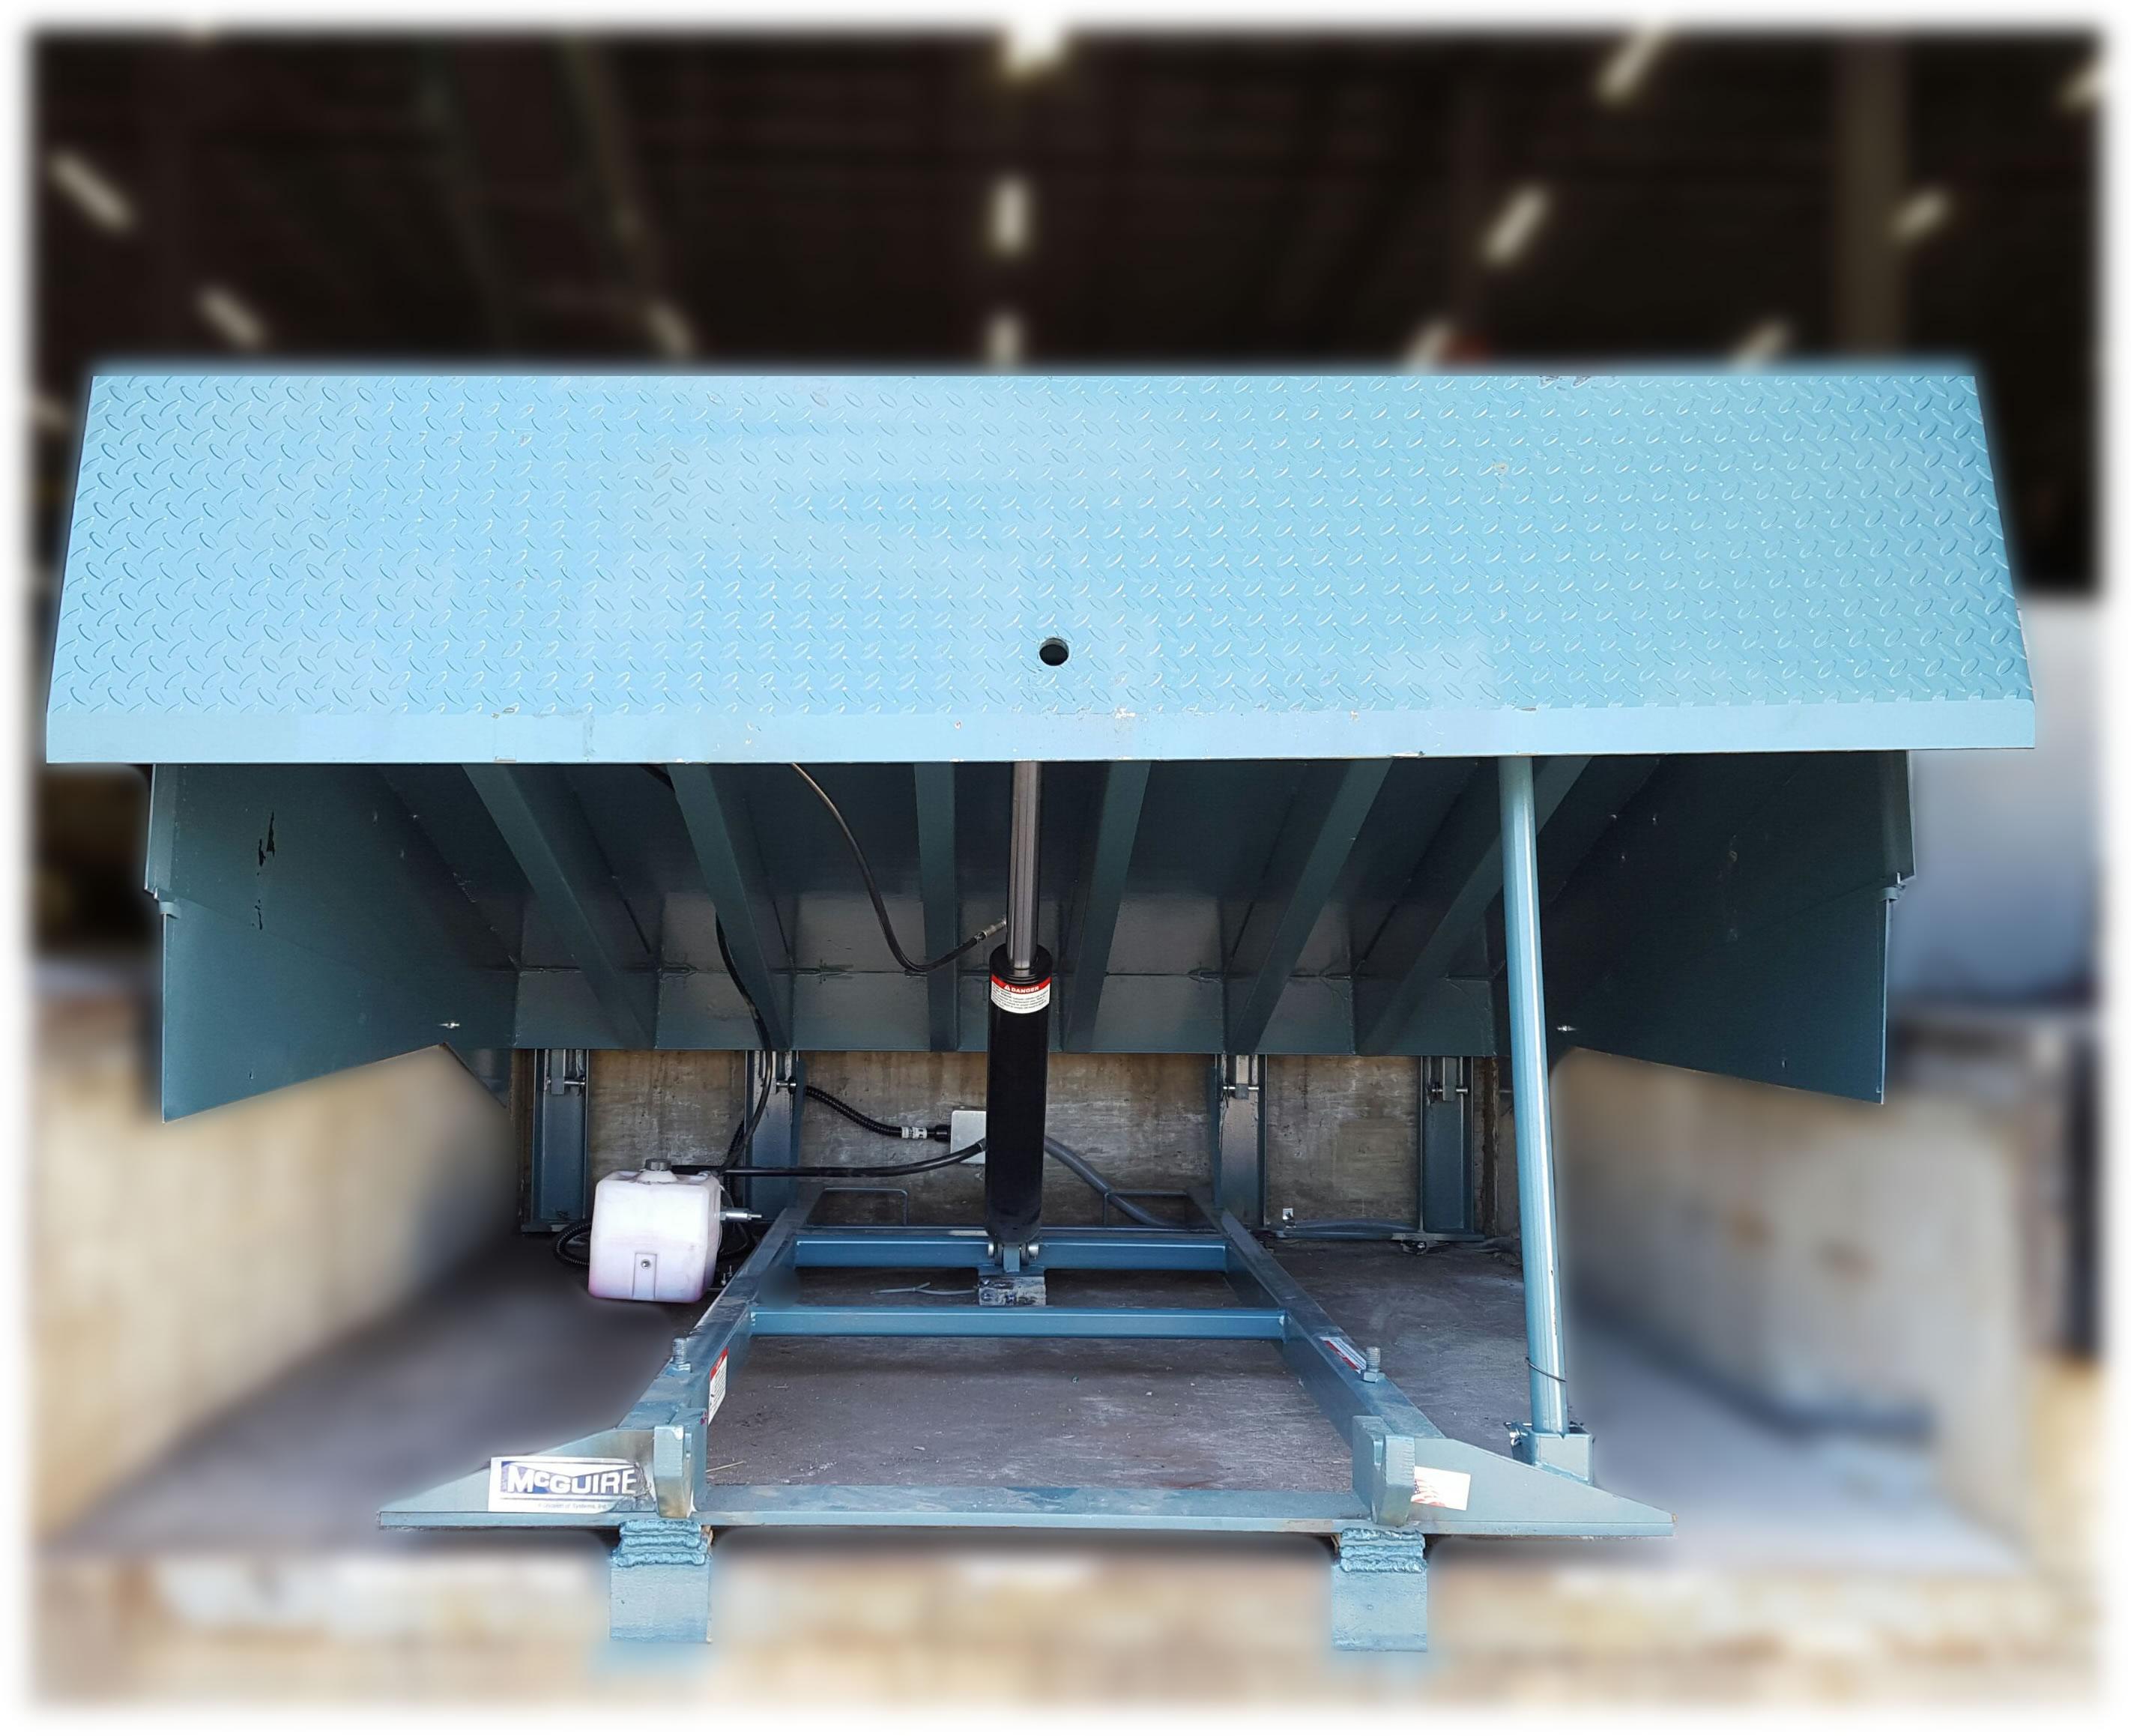 Dock Levelers, Dock Plate, Dock Bay Plate, Door Docks, Dock Levelators, Hydraulic Dock Lifts, Electric Dock Plates